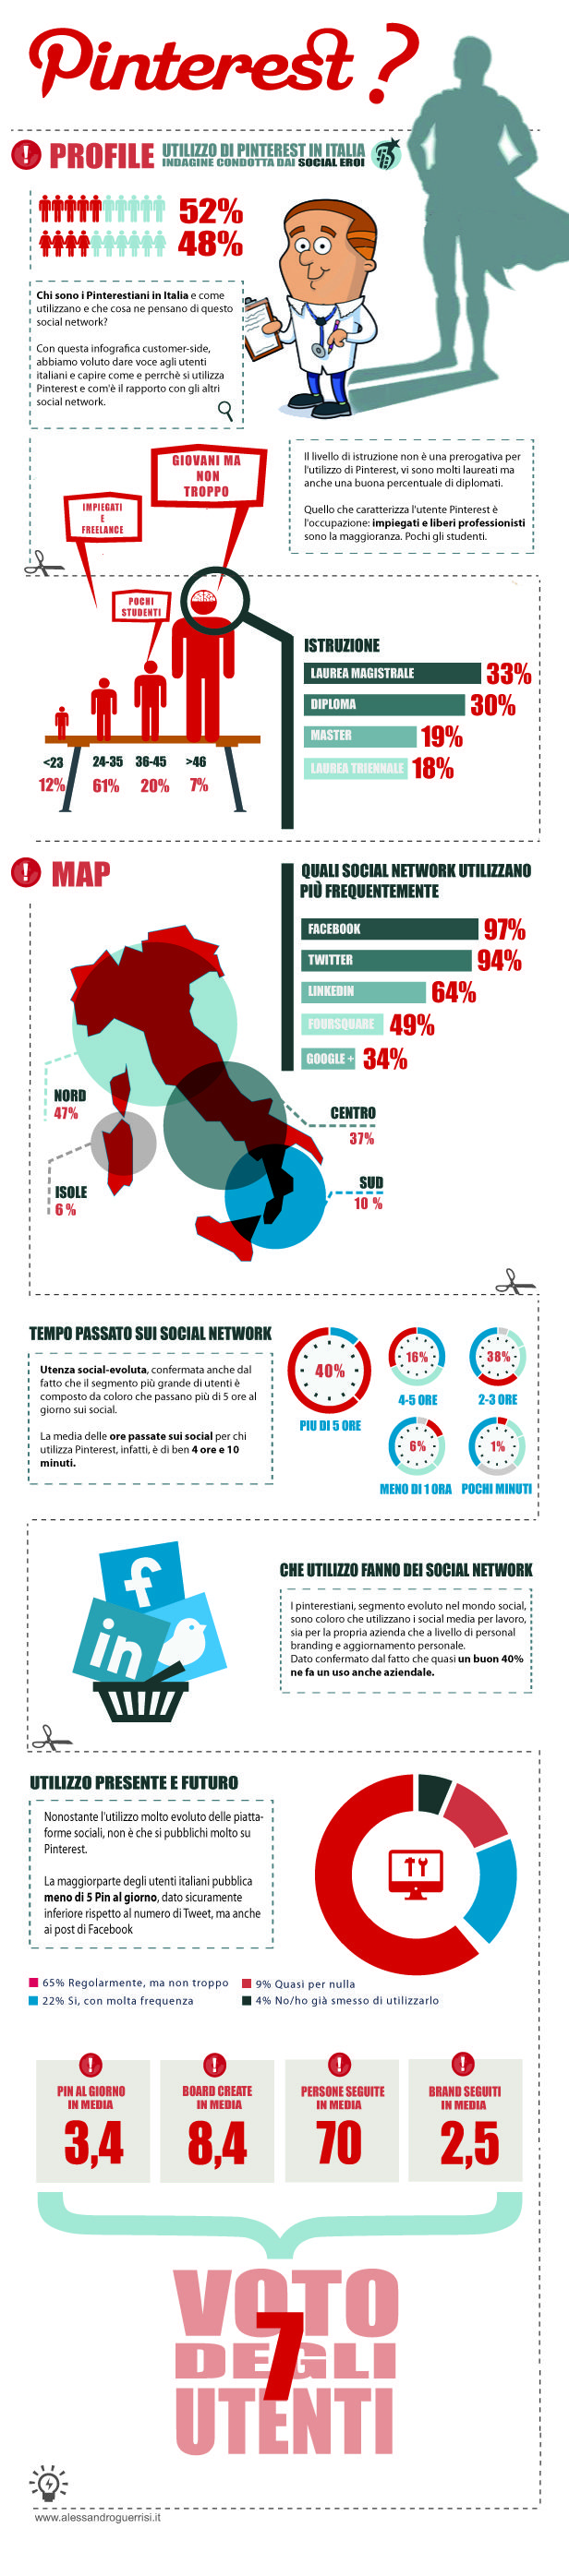 infografica uso di Pinterest in Italia Infografica